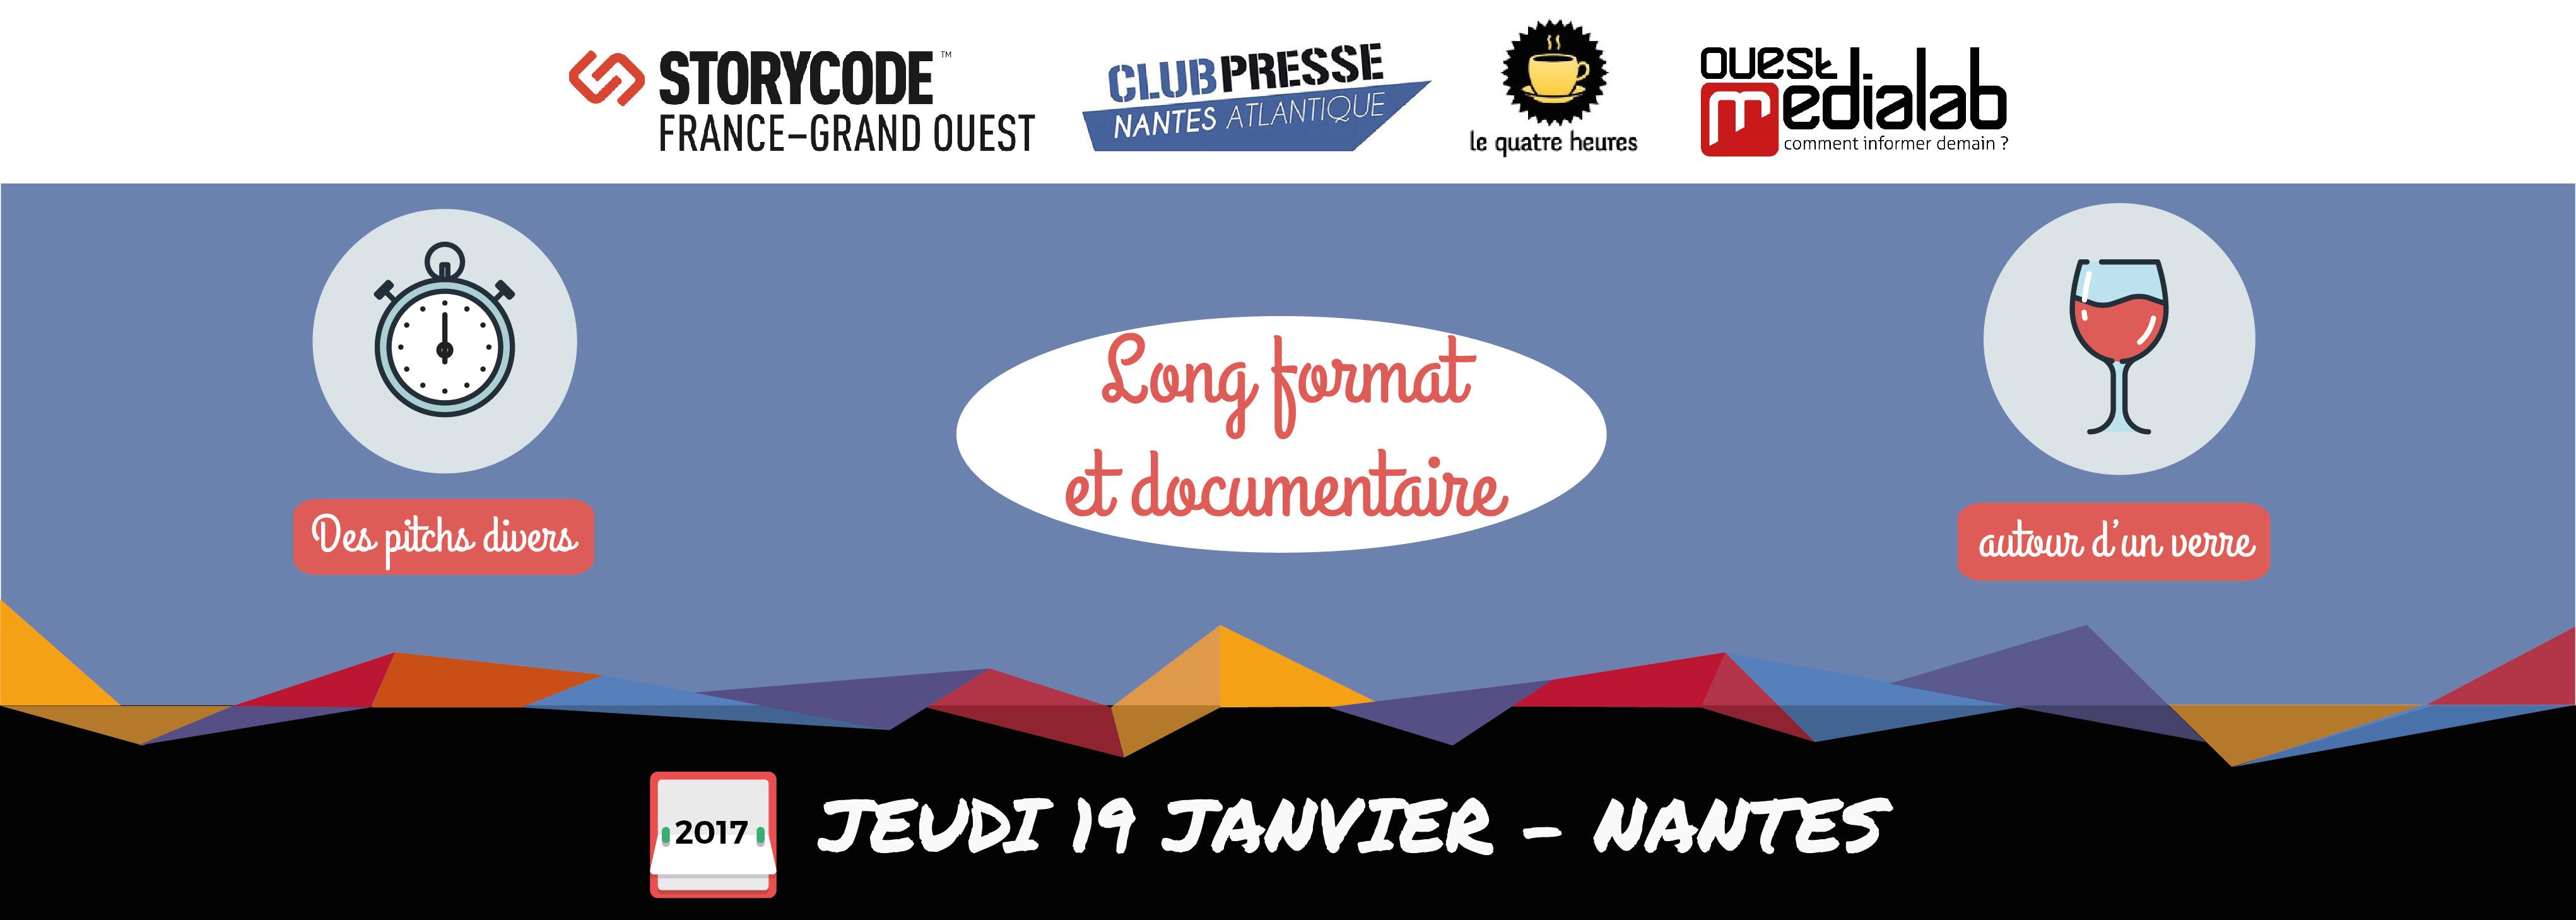 slider-StoryCode-Club-de-la-presse-Nantes-01